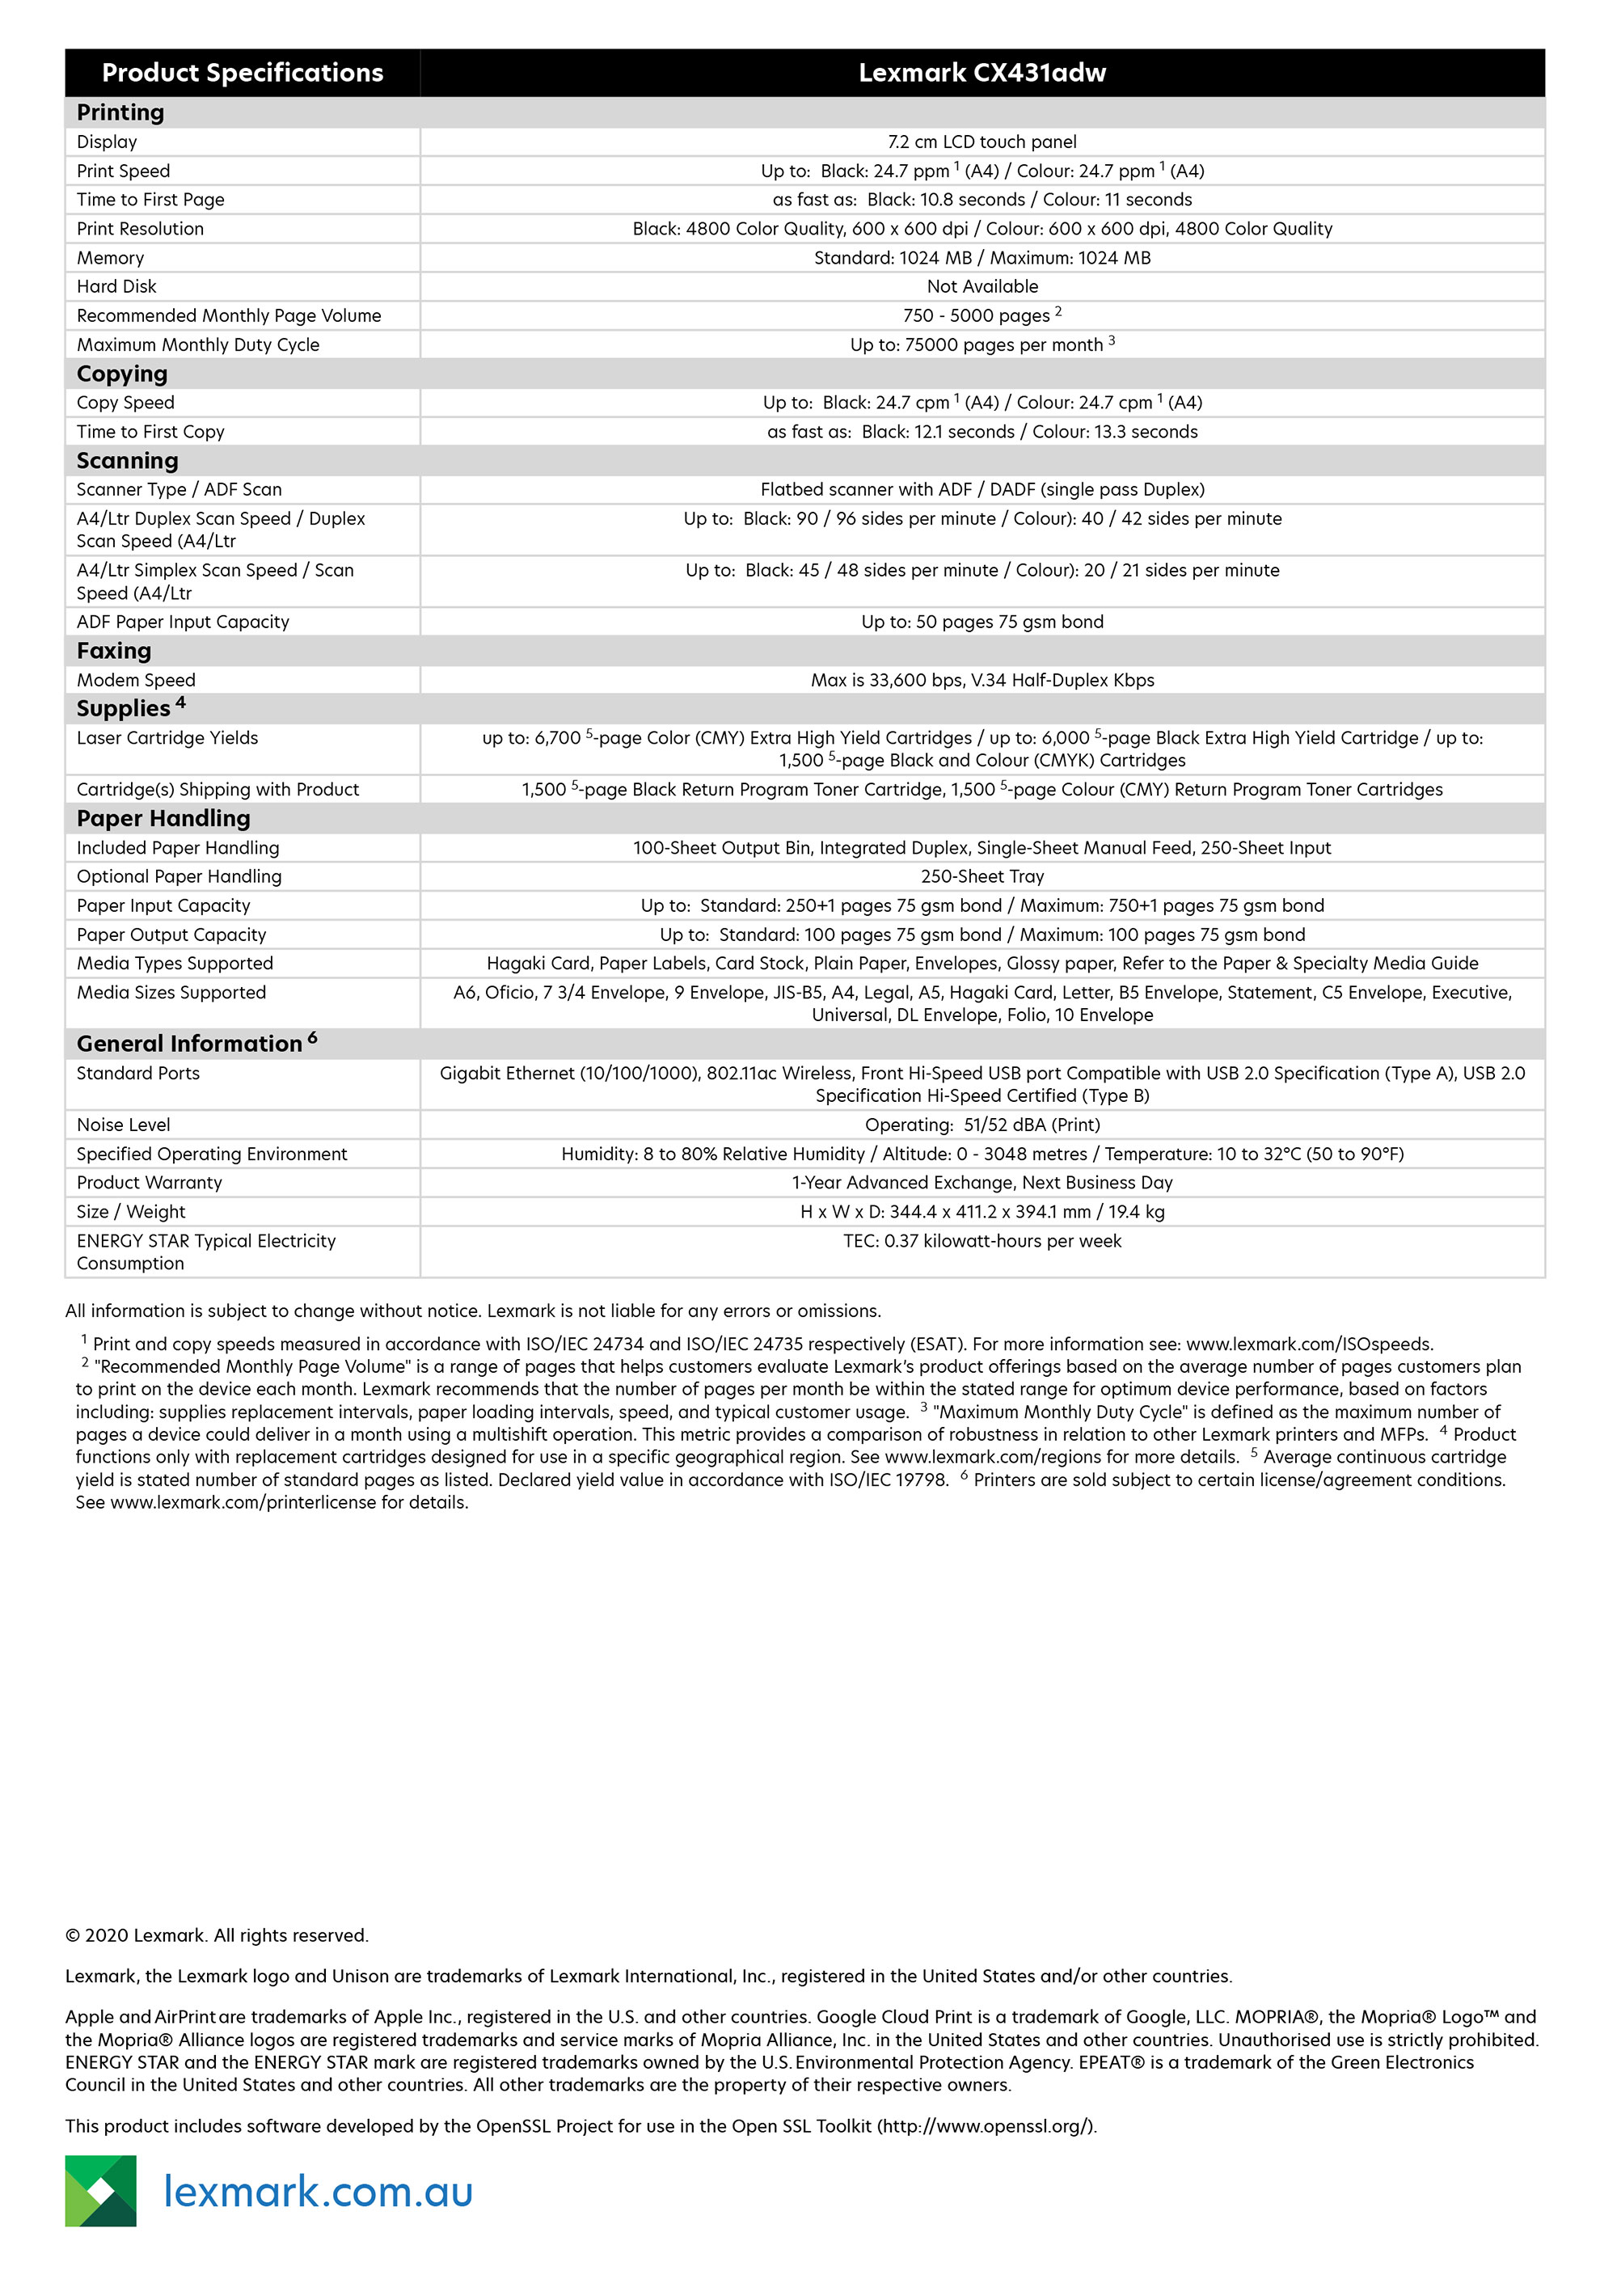 Lexmark CX431adw specs